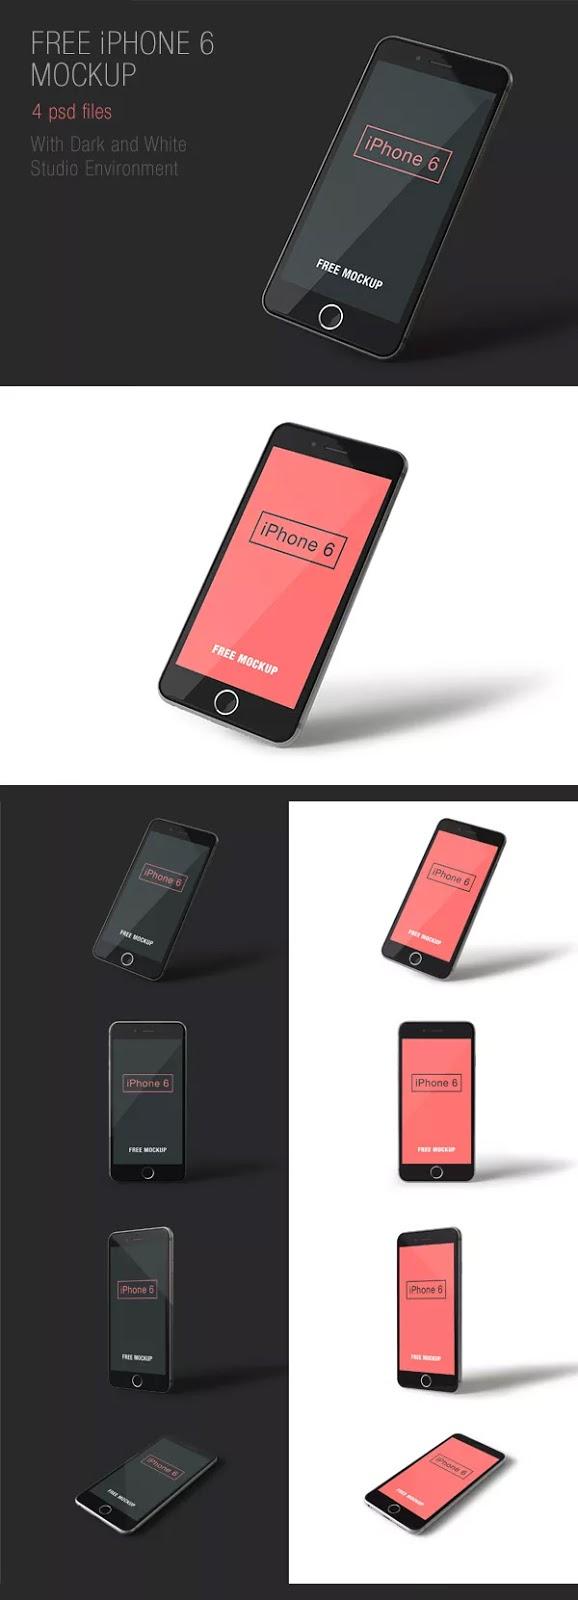 Smartphone & Tablet Mockup PSD Terbaru Gratis - iPhone 6 PSD Mockups